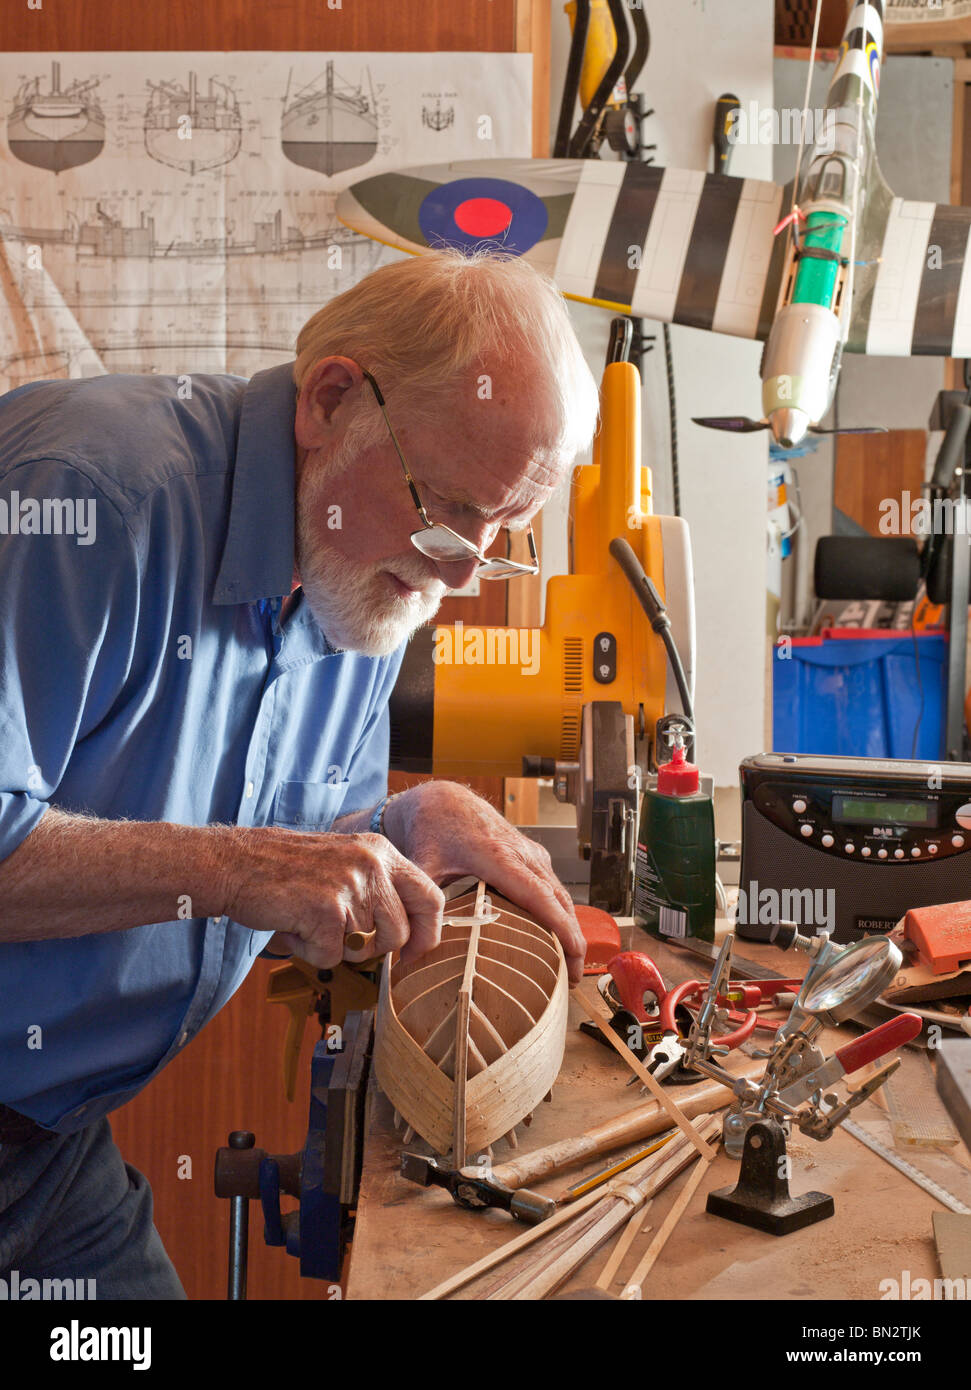 Older man, retiree, making model boat in workshop. UK - Stock Image